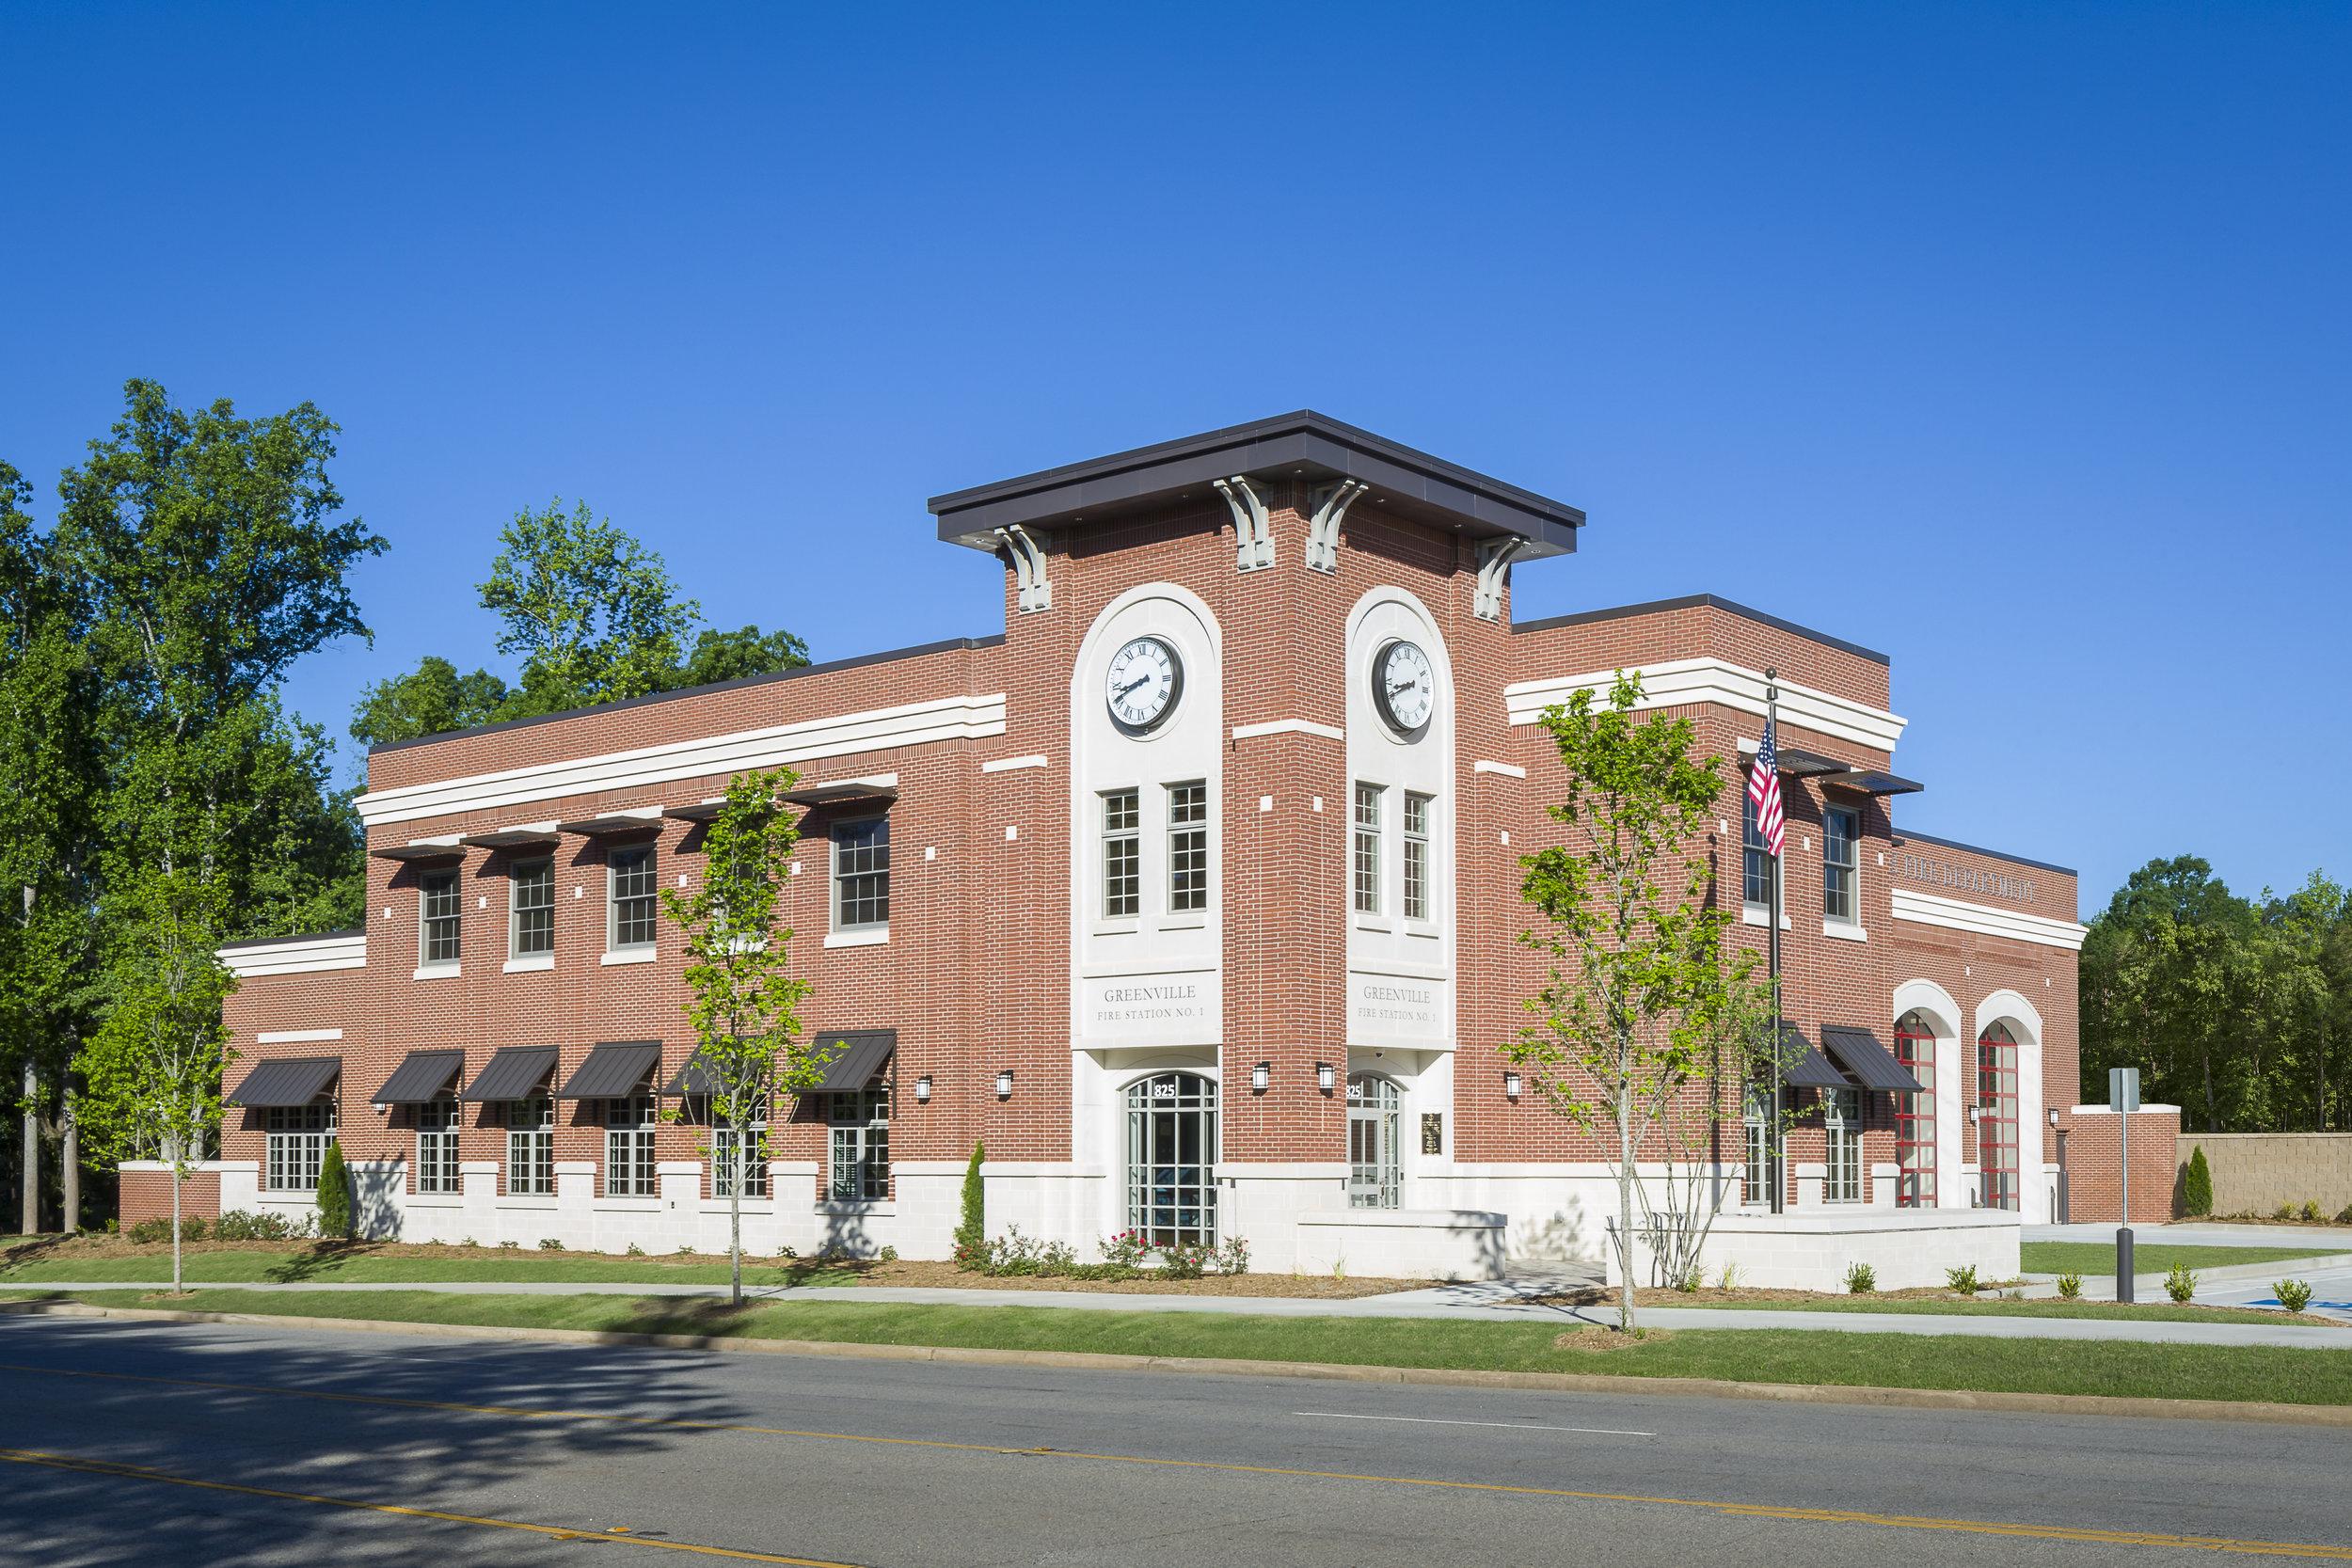 ADW-Public-Safety-Fire-Station-1-Greenville-SC-Banner.jpg